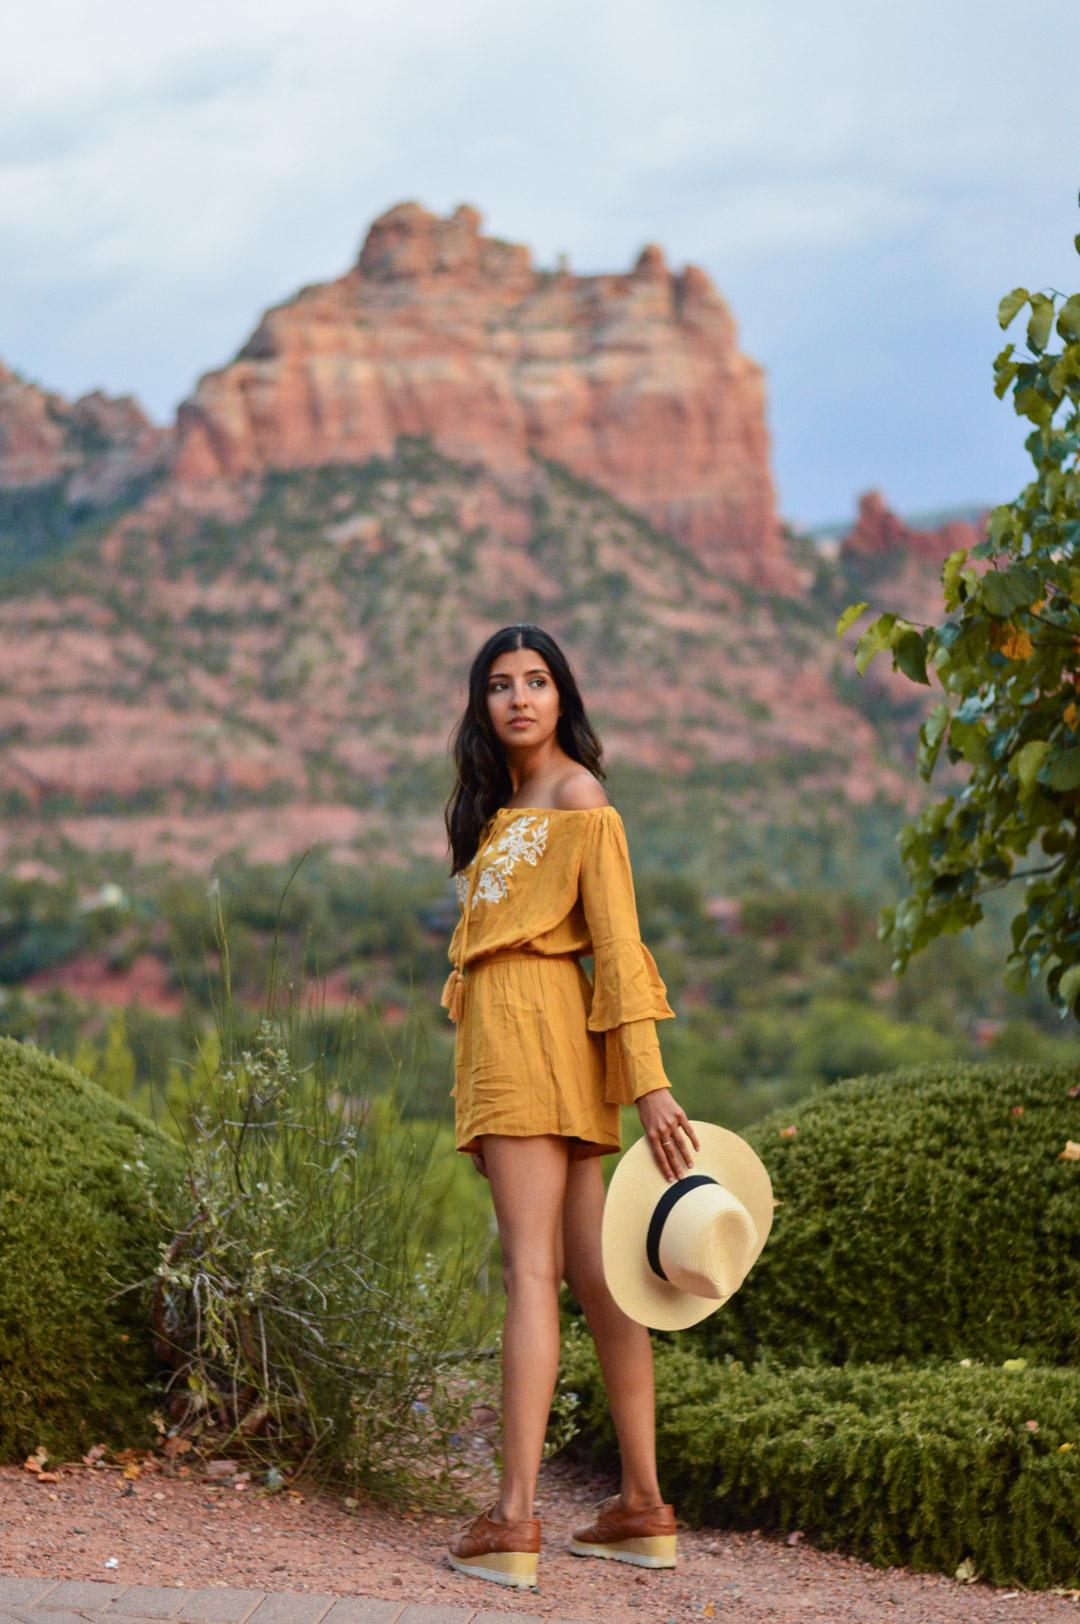 sedona-arizona-mustard-yellow-marigold-romper-travel-blogger-outfit 5